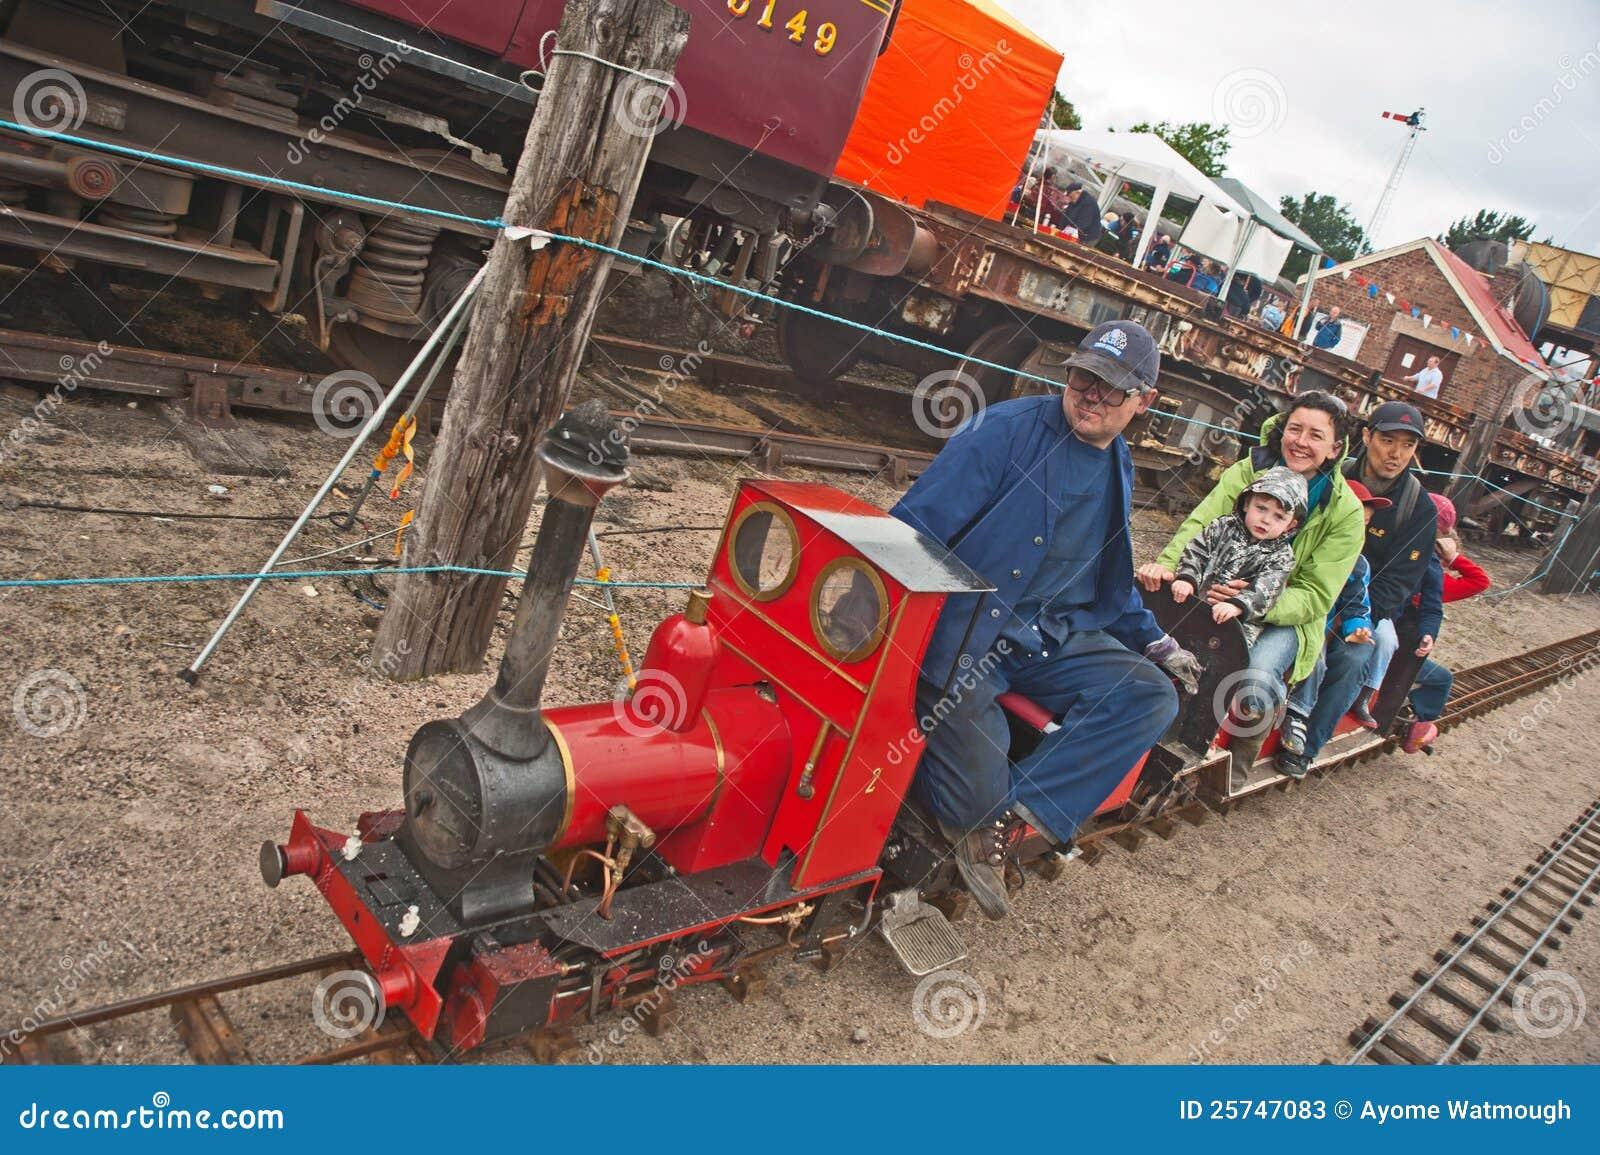 Rides on model steam railway